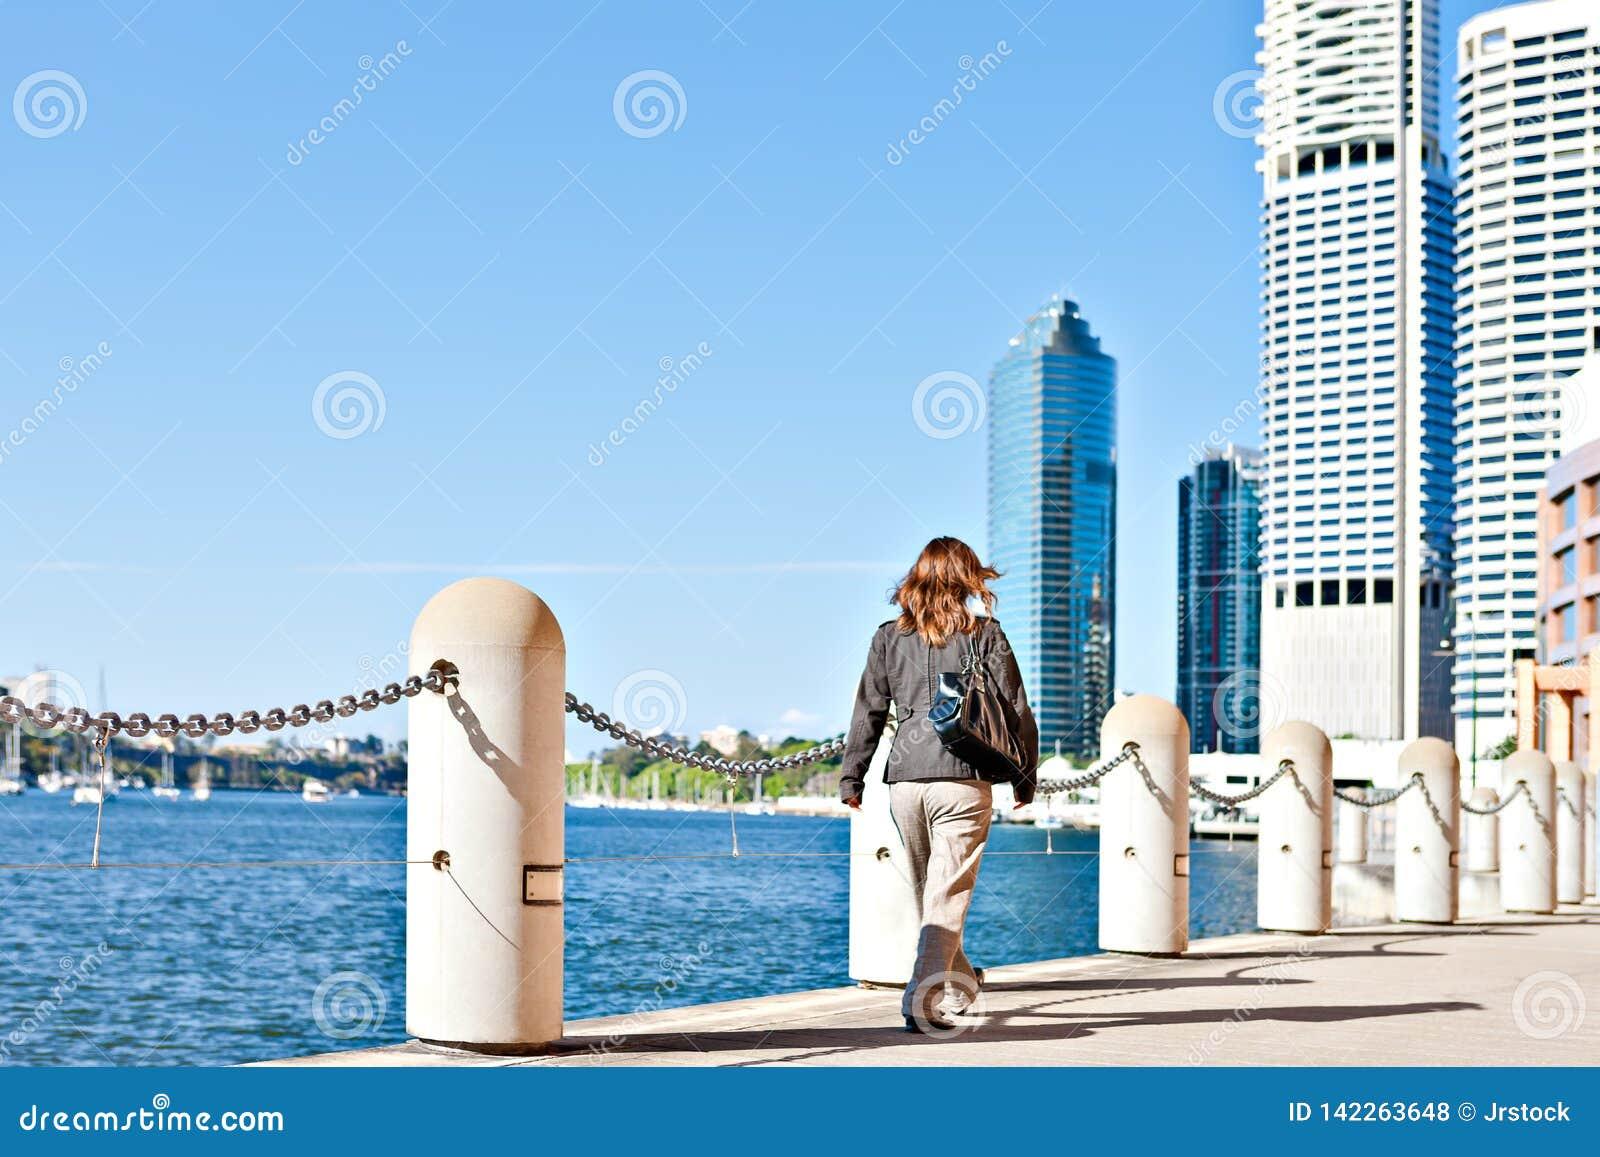 Women walk on the street near to a fence